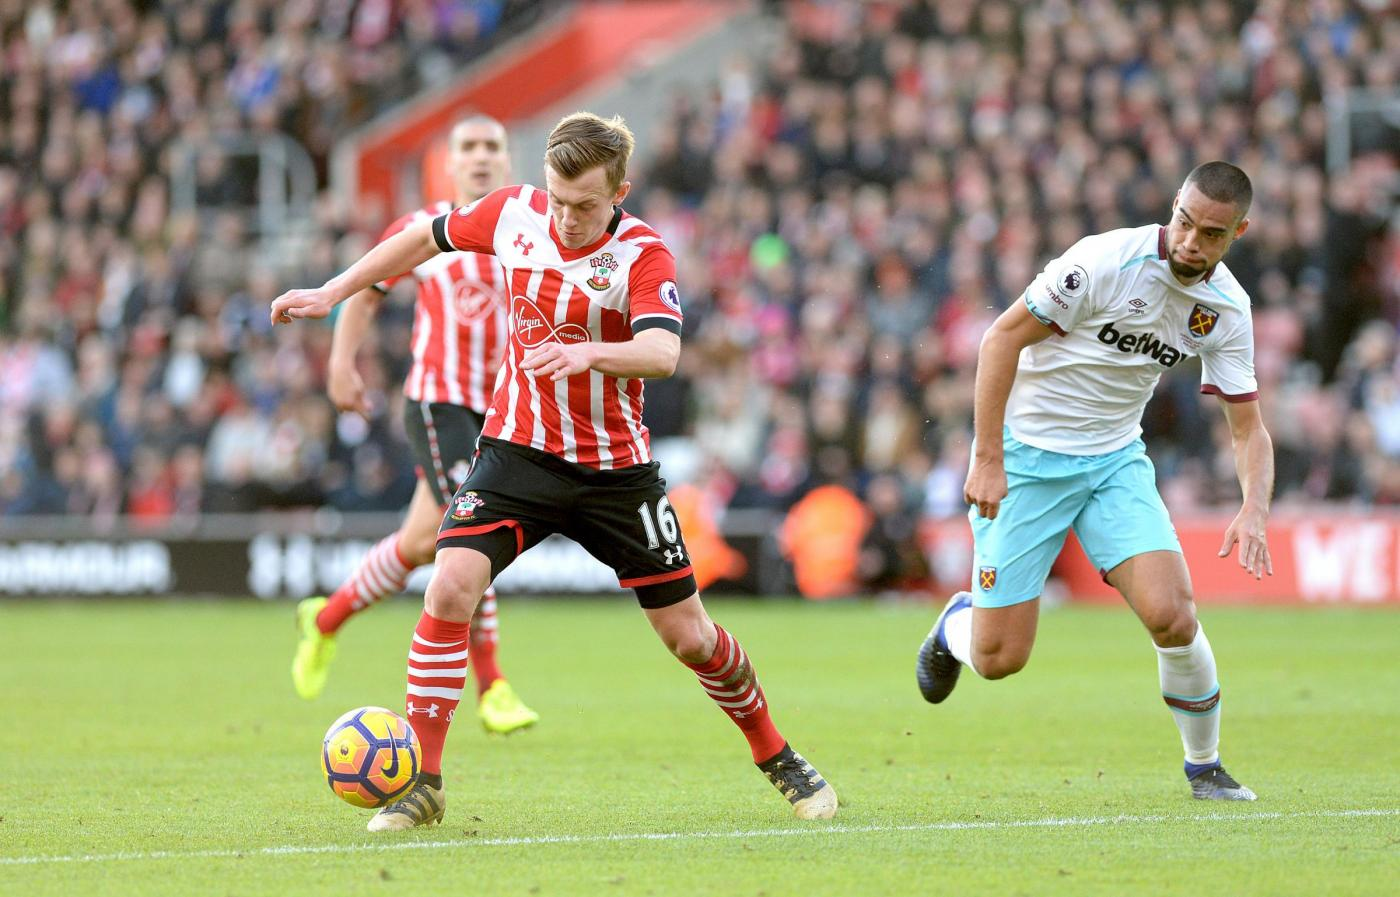 Southampton-Brighton 31 gennaio, analisi e pronostico Premier League giornata 25